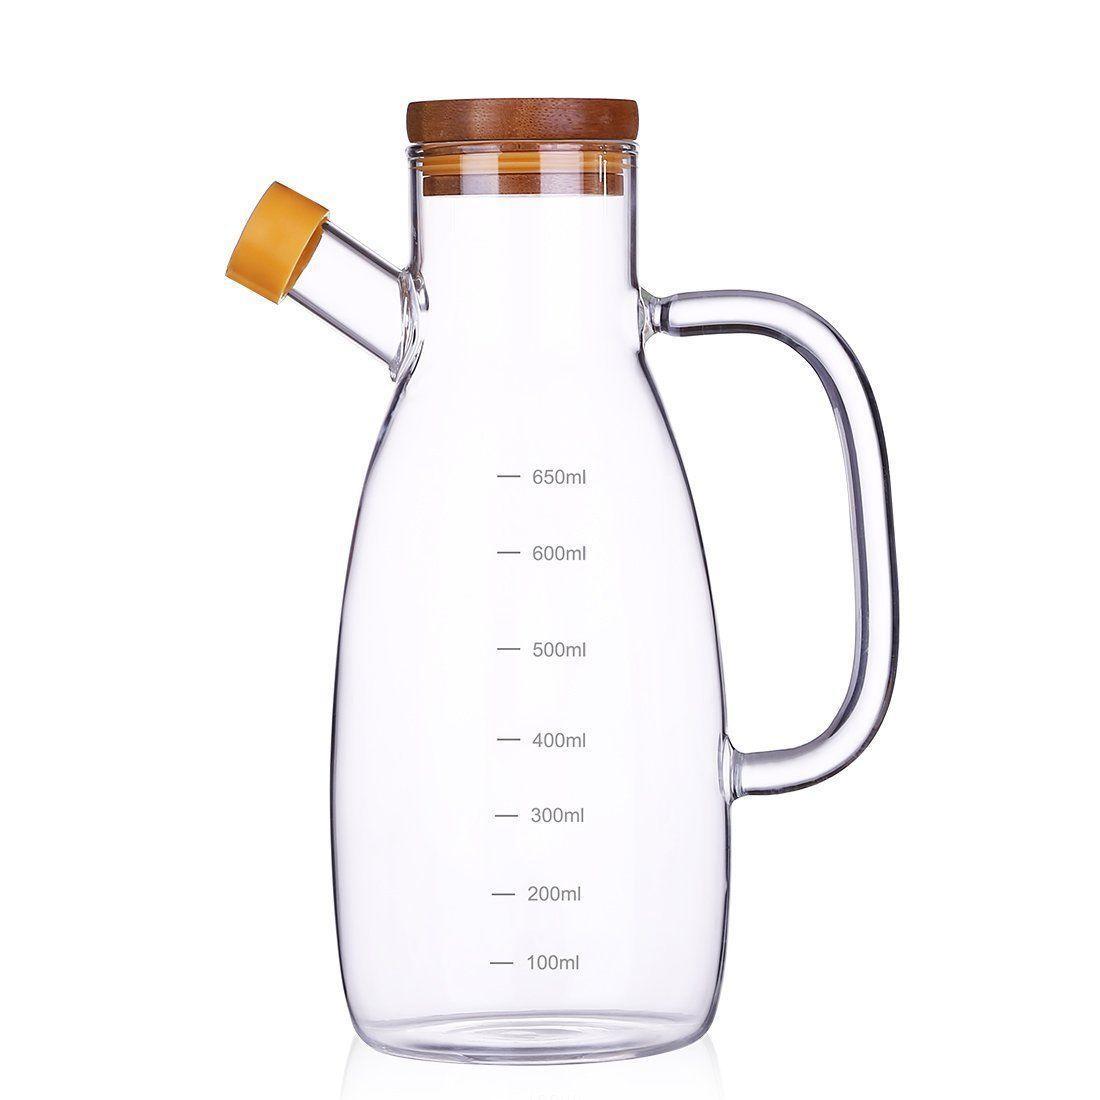 23 Oz Olive Bottle Set Vinegar Dispenser Container Pourer Sprayer Kitchen Storage Container At